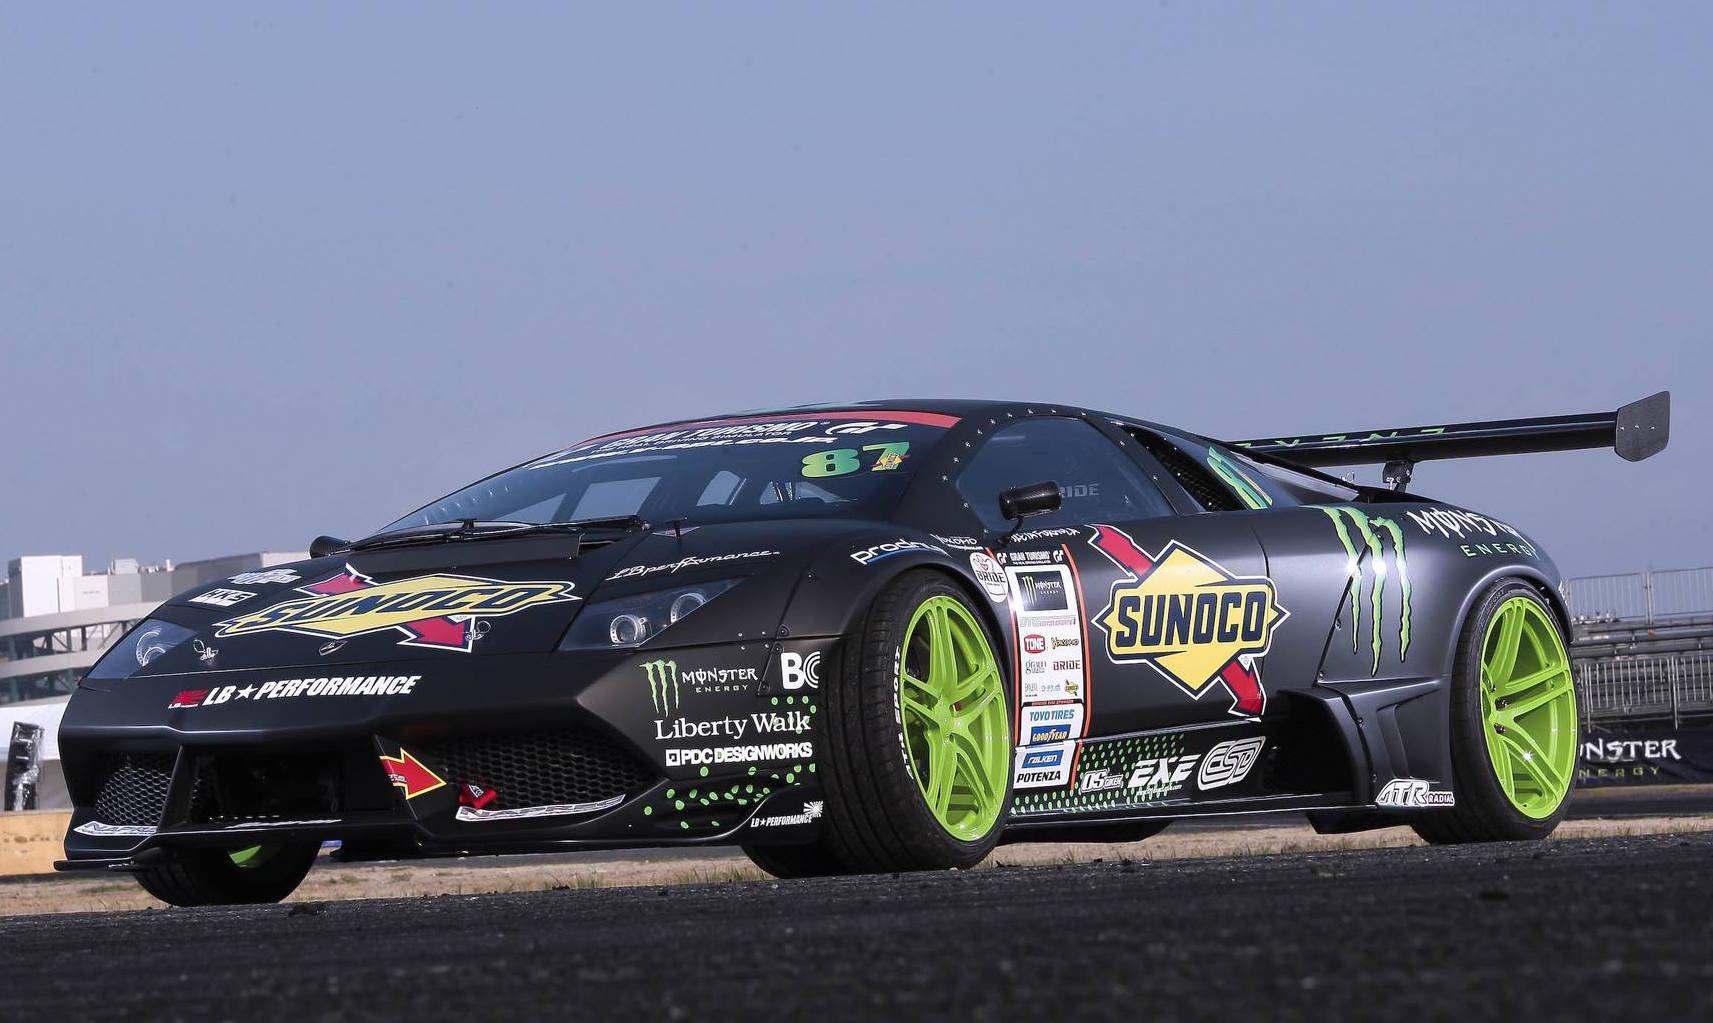 Lamborghini Murcielago Drift Car Begins Testing Uses Rwd Conversion Performancedrive